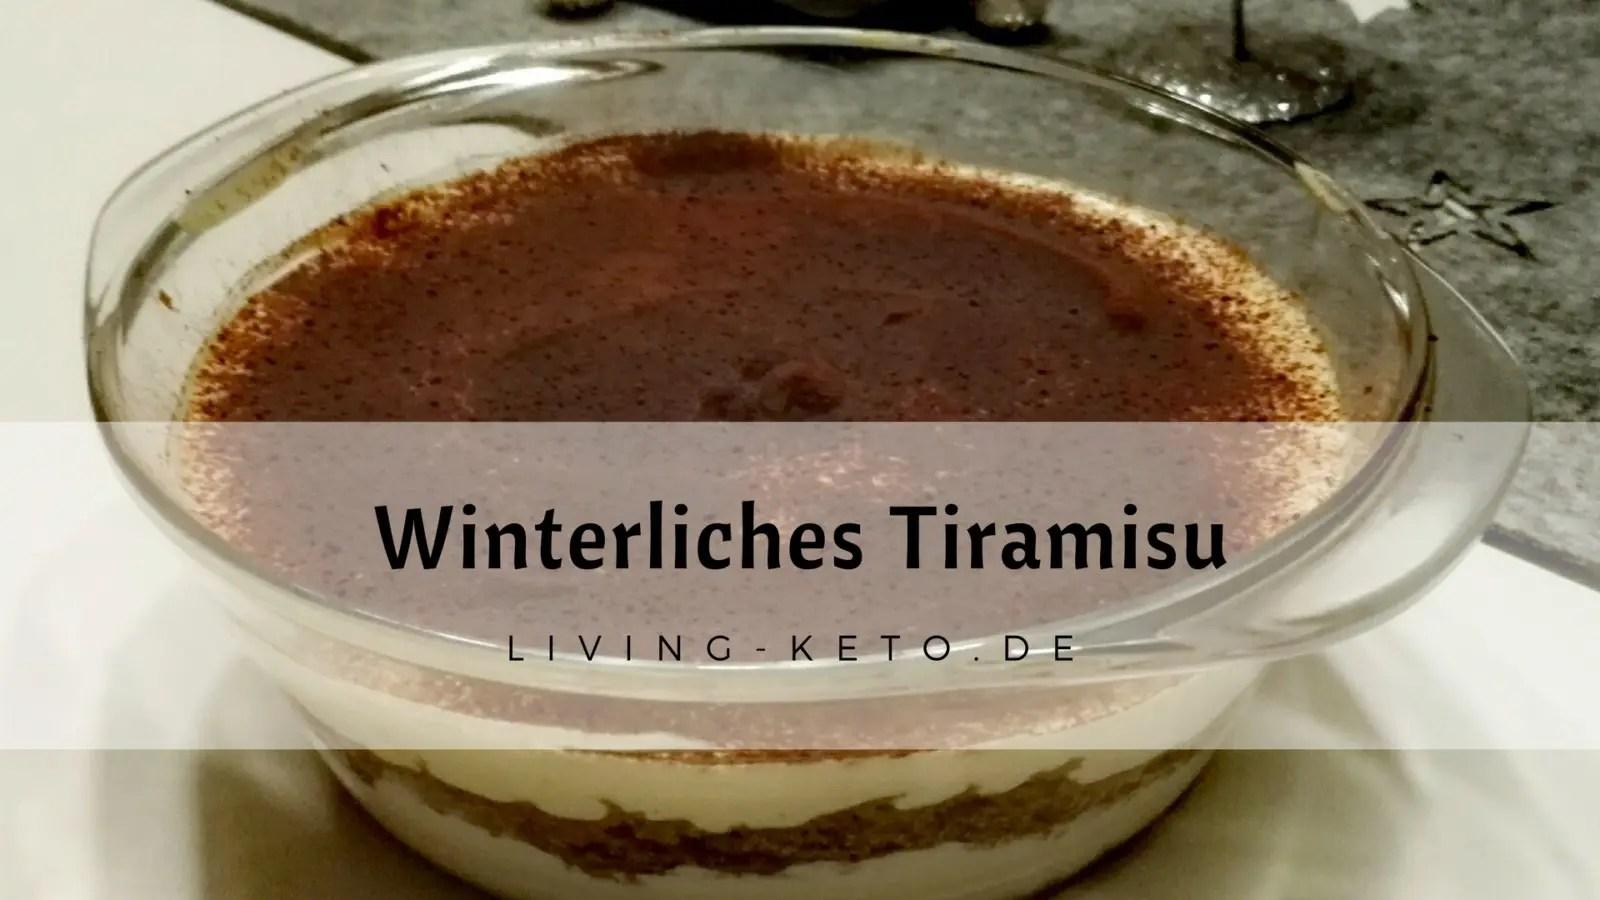 Tiramisu – italienisches Keto-Dessert